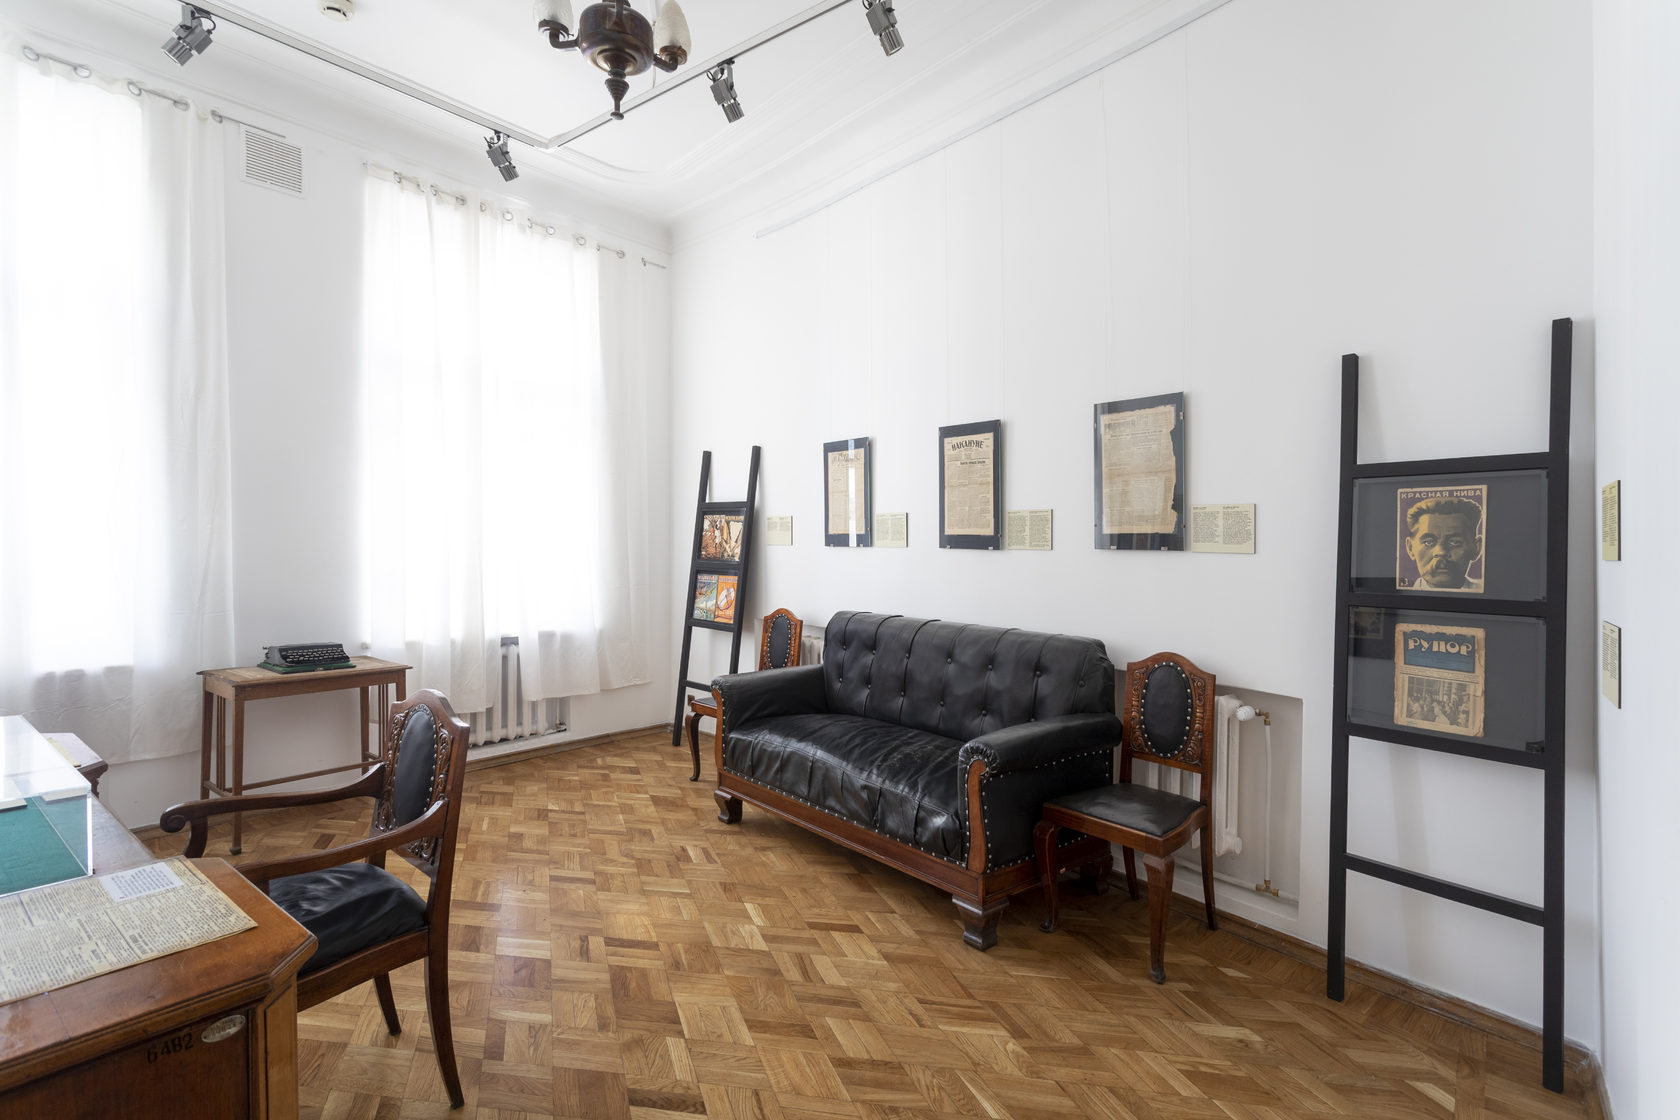 Доме музее булгакова довоенные фото